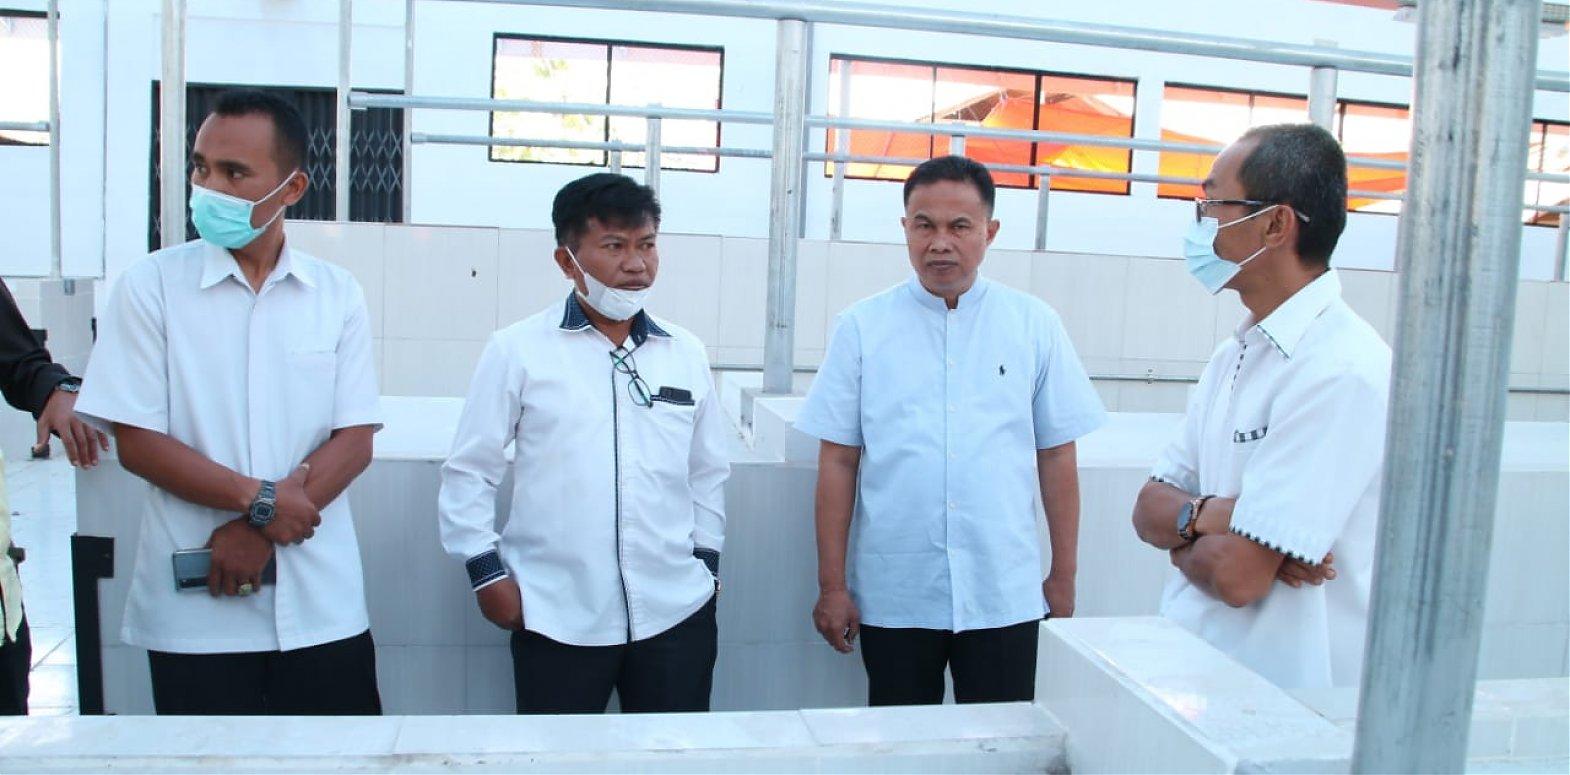 Terkait LKPJ Bupati Tahun 2020, Pansus II DPRD Agam Terima Keluhan Masyarakat Sungai Batang